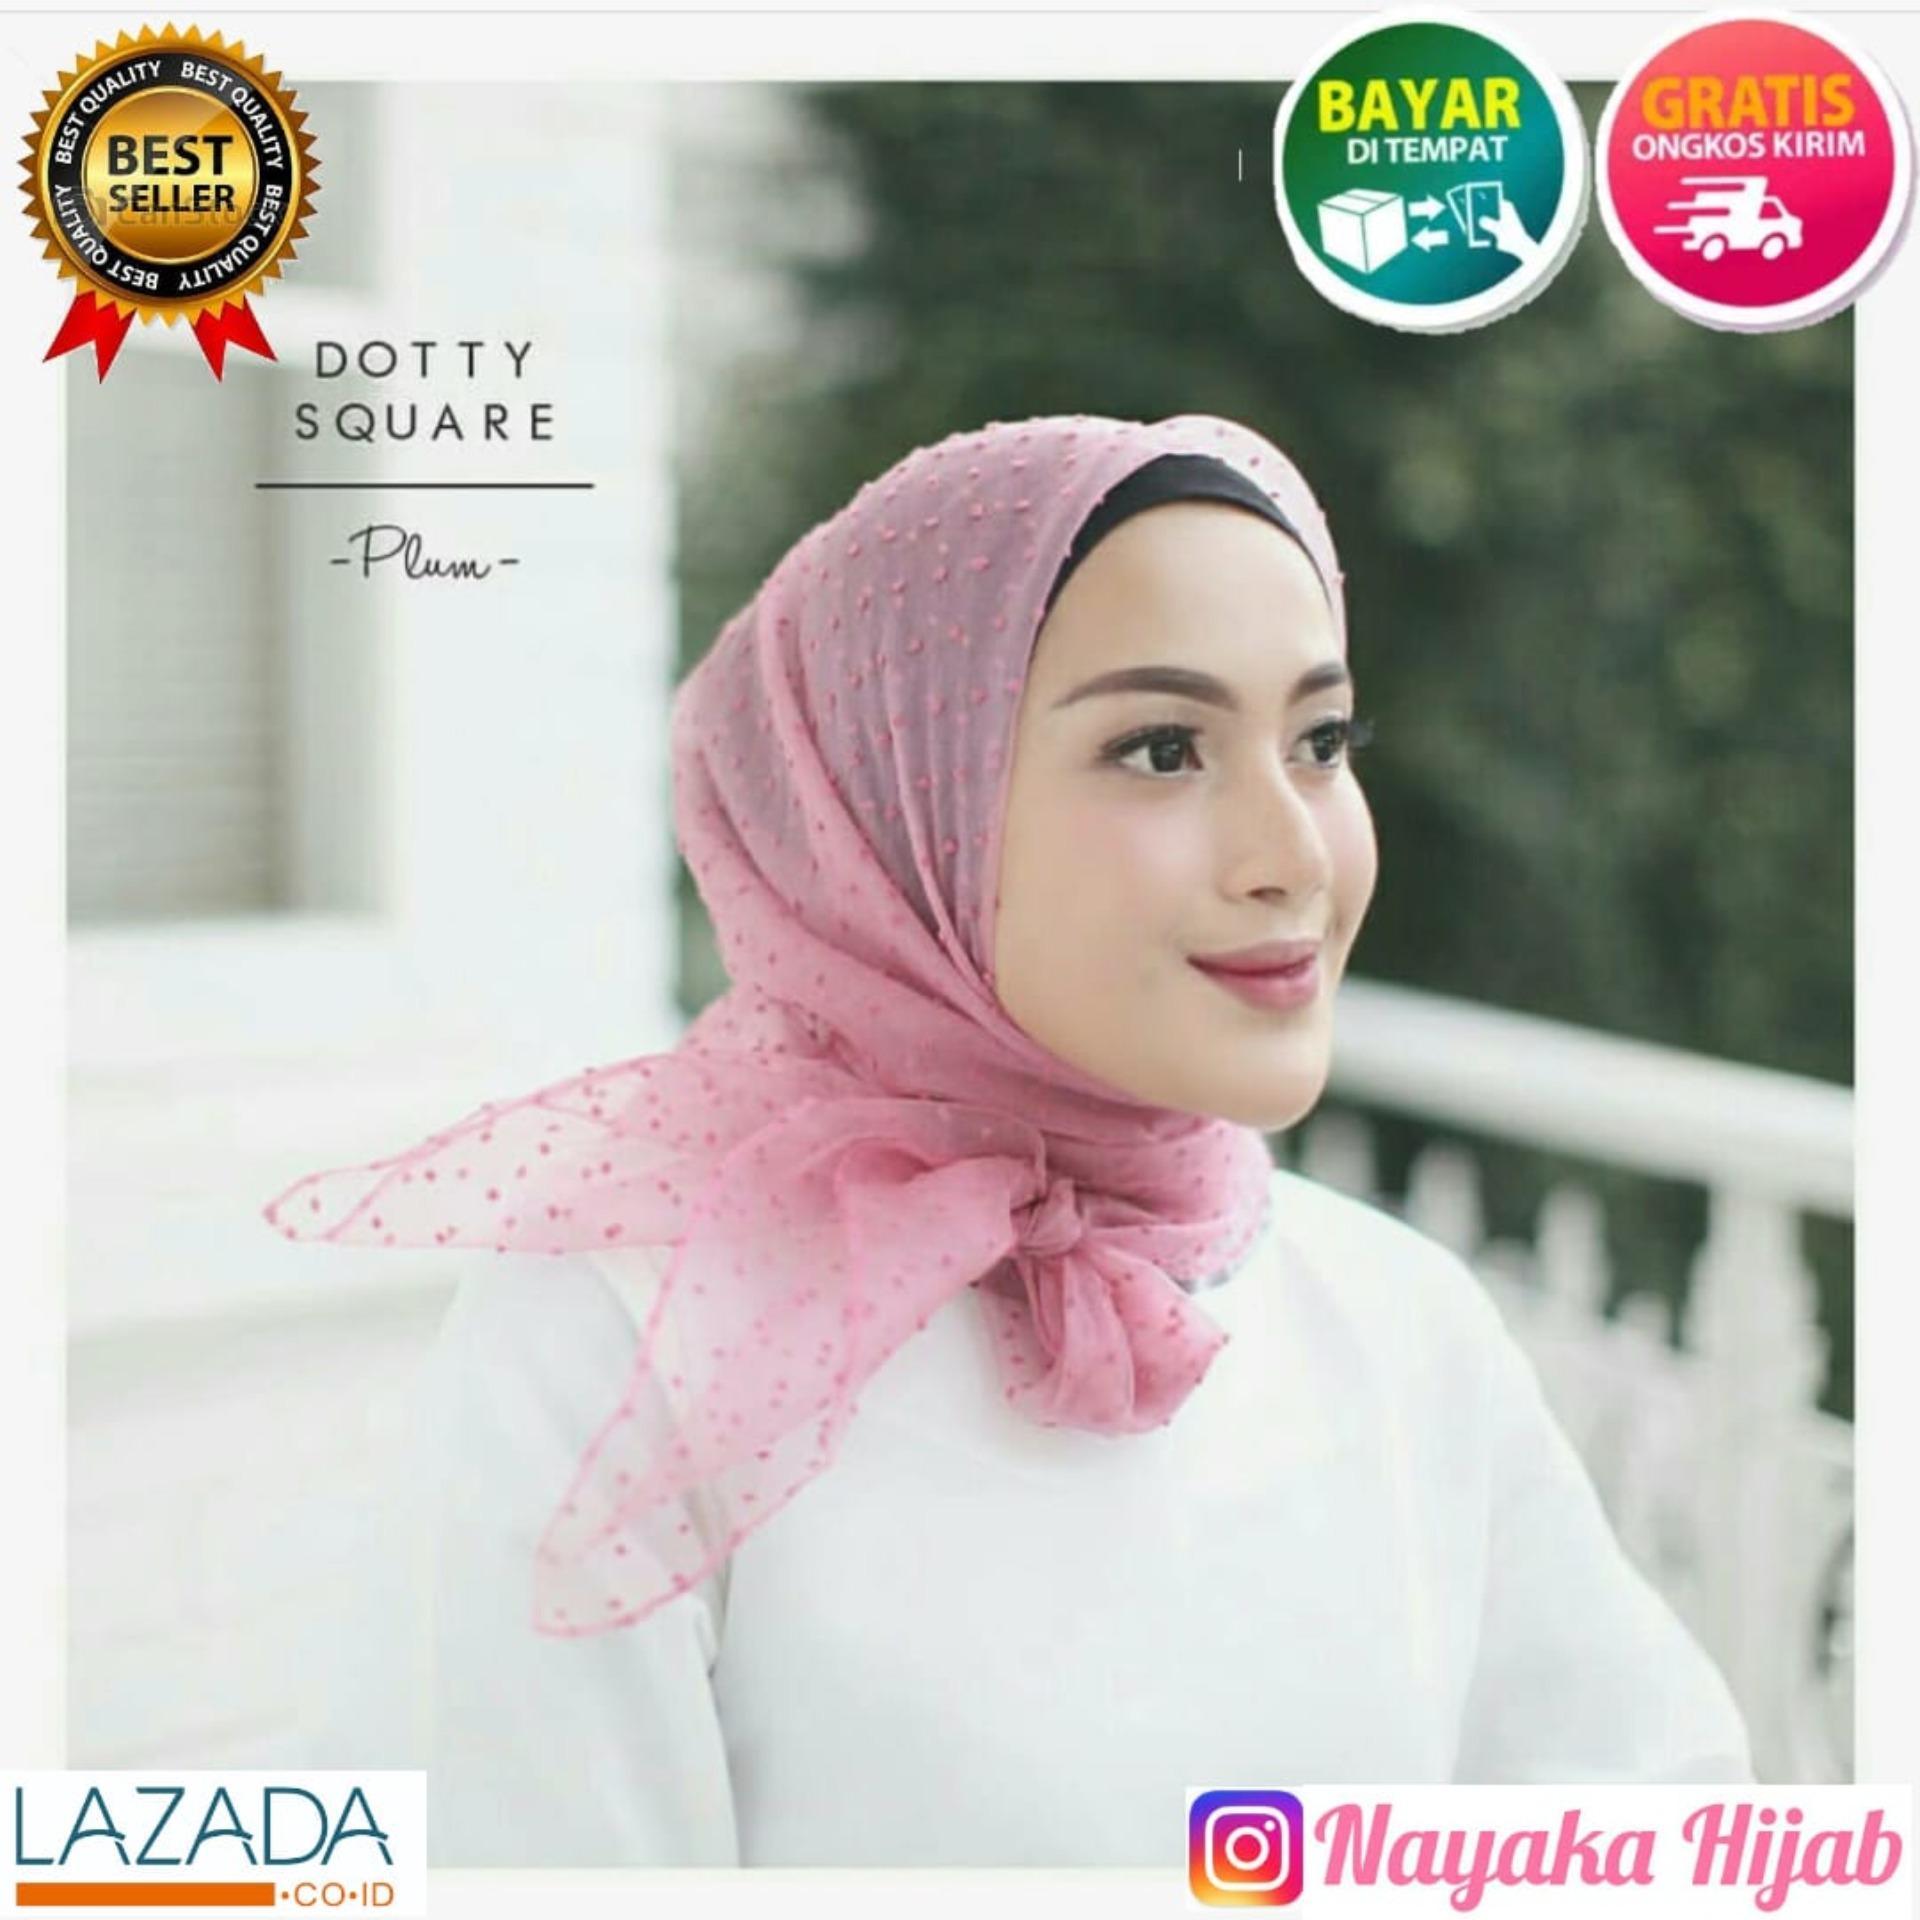 PROMO Jilbab Organza dot | Hijab Organza dot | HijabOrganza Square Best Seller dot | Jilbab Segi empat organza Dot